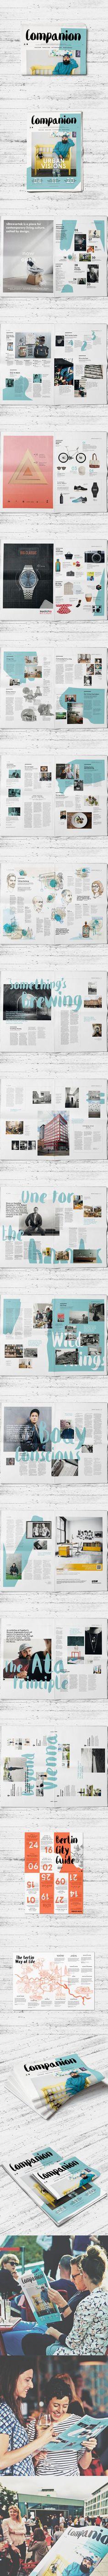 print design / editorial   Companion Magazine #02 by Stefan Schuster